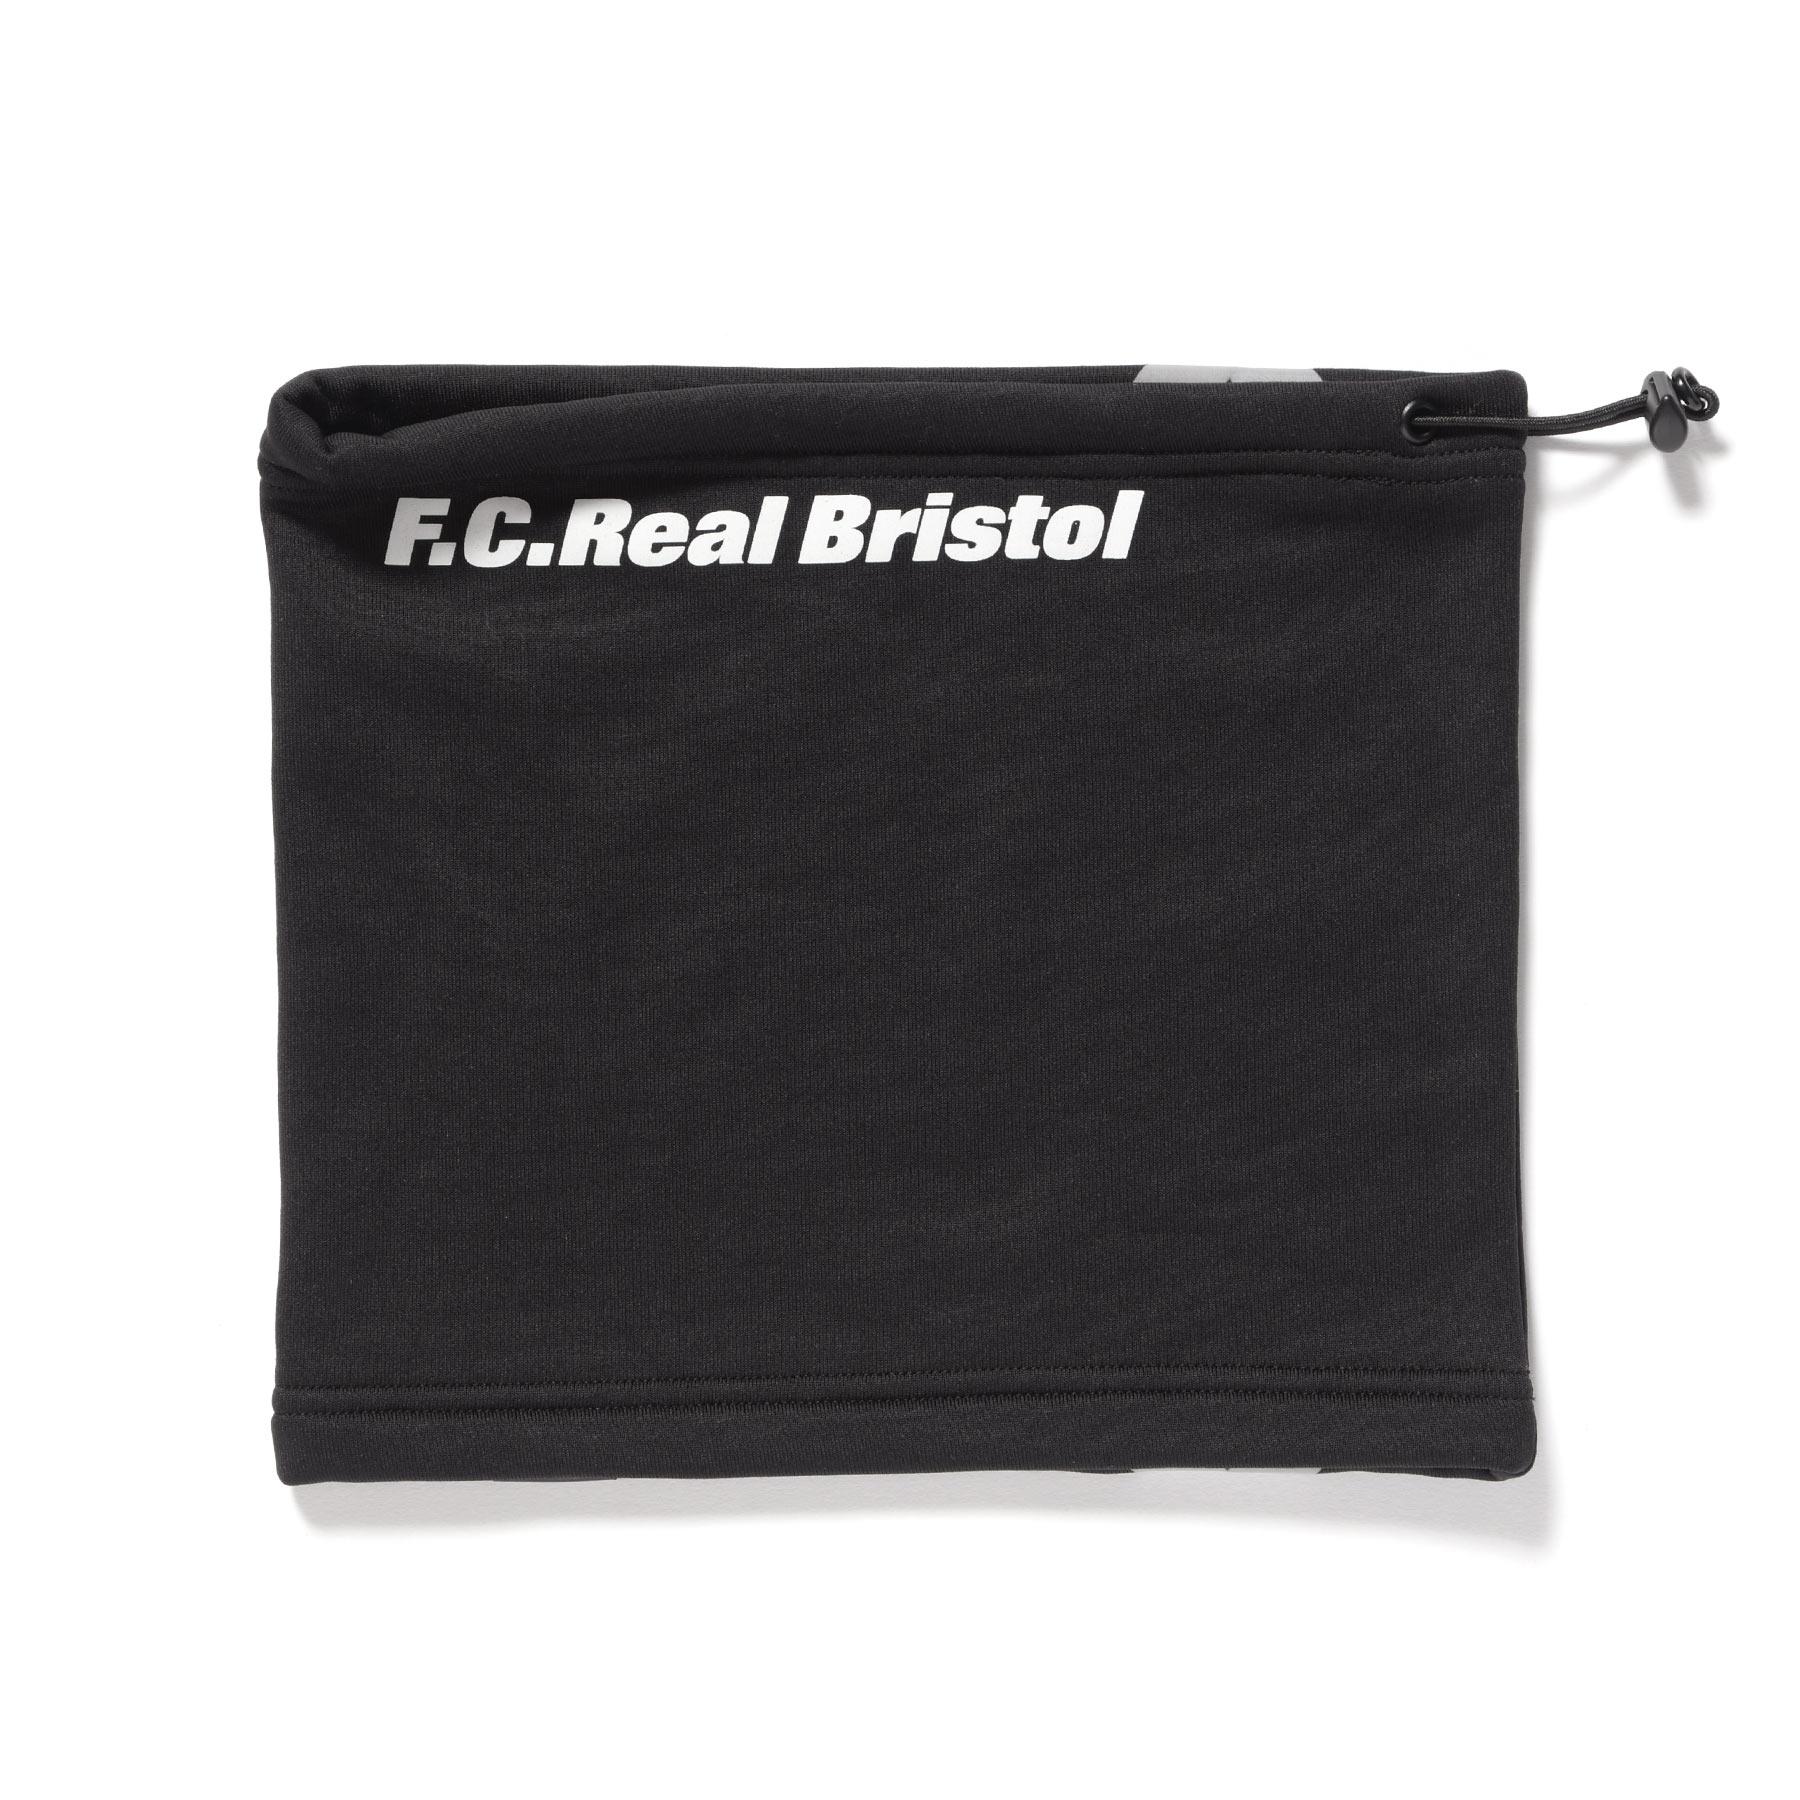 F.C.Real Bristol / POLARTEC FLEECE NECK WARMER -BLACK